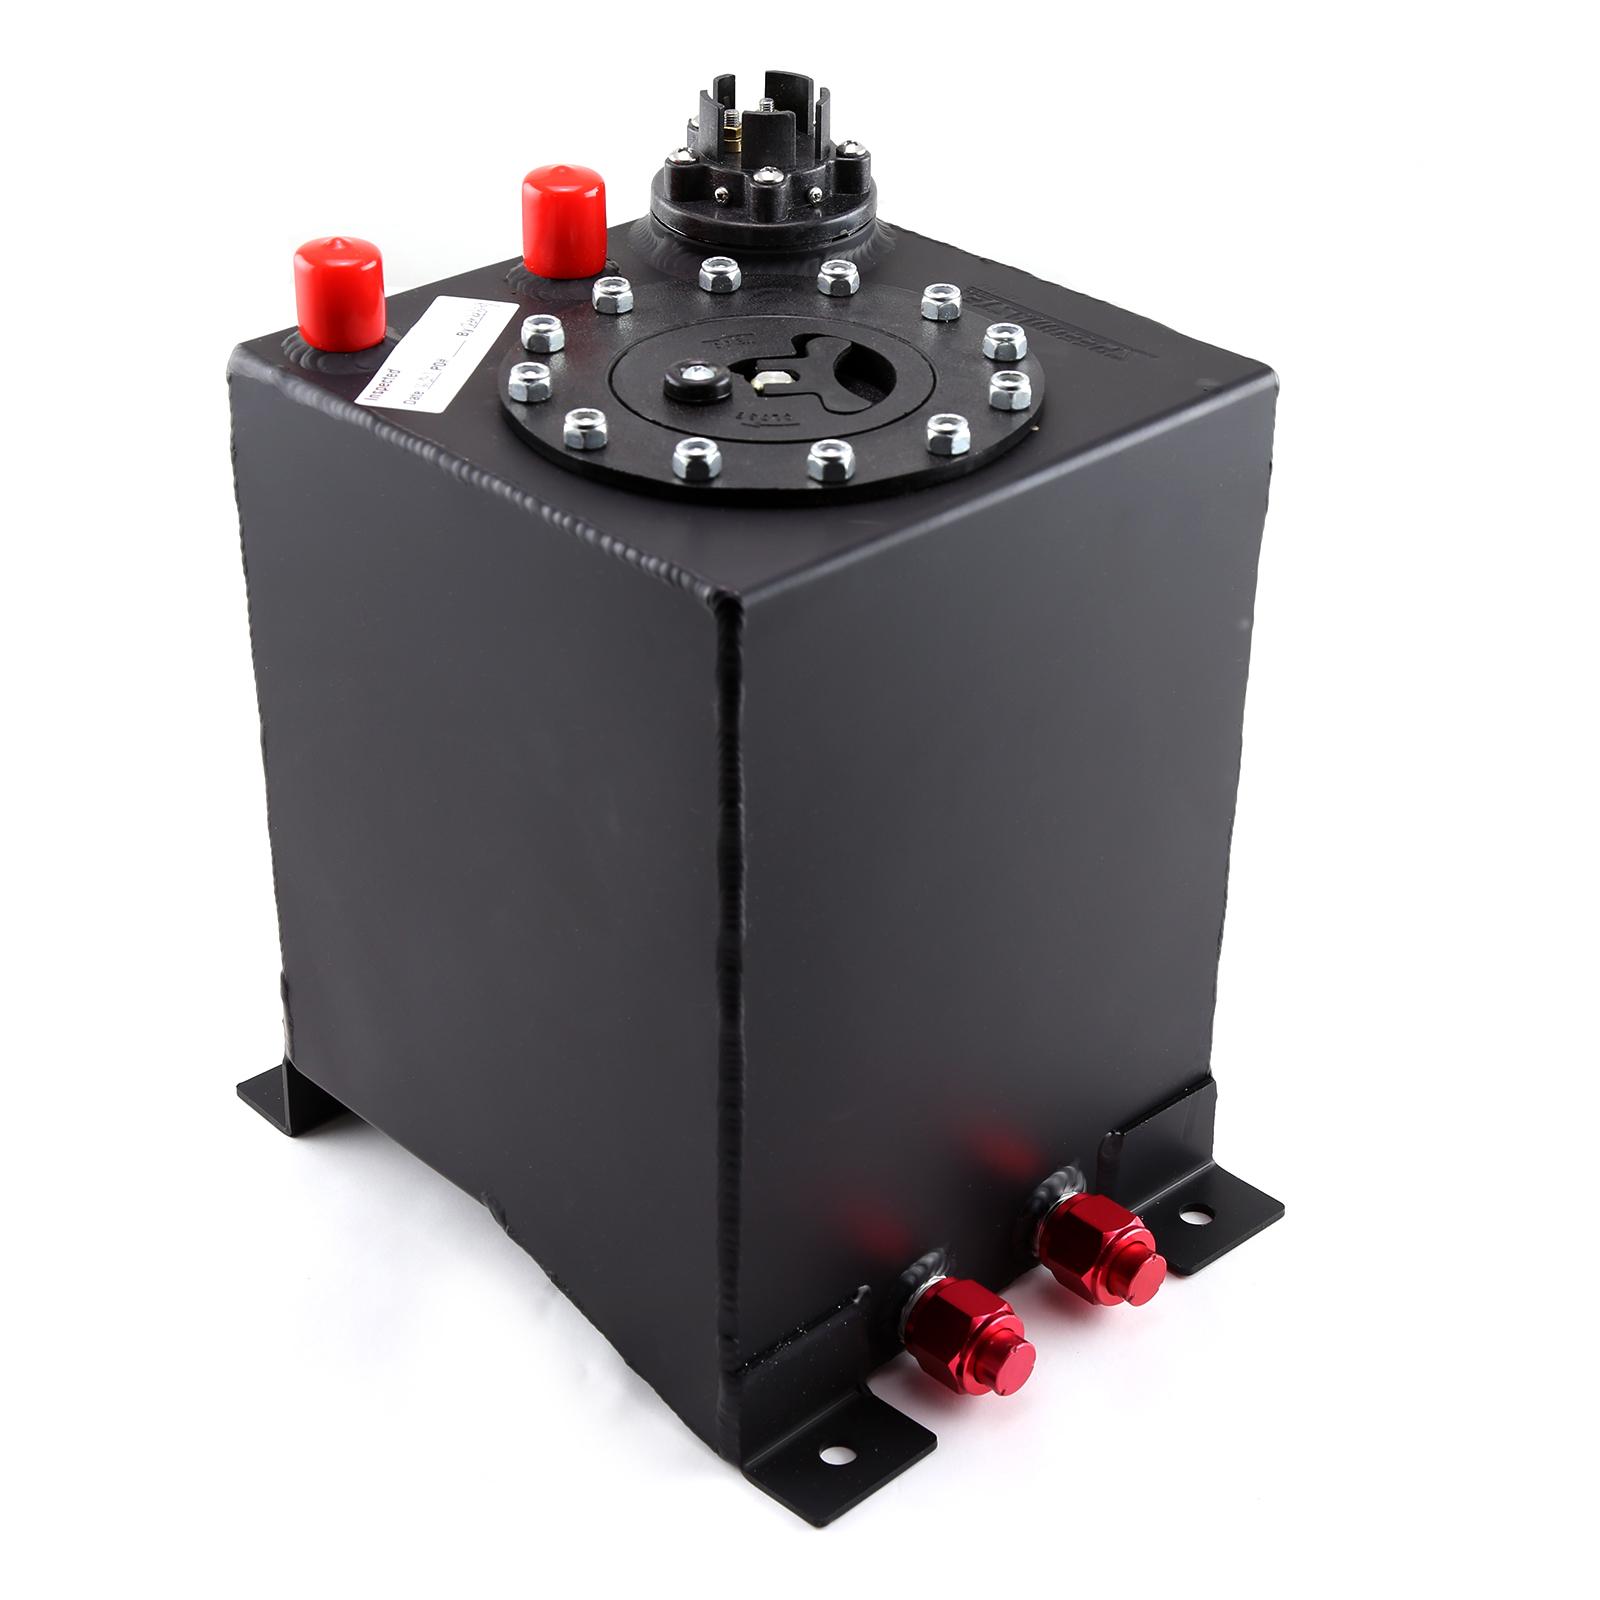 Speedmaster 2.5 Gallon / 10 Litre Black Aluminum Fuel Cell w/Sending Unit